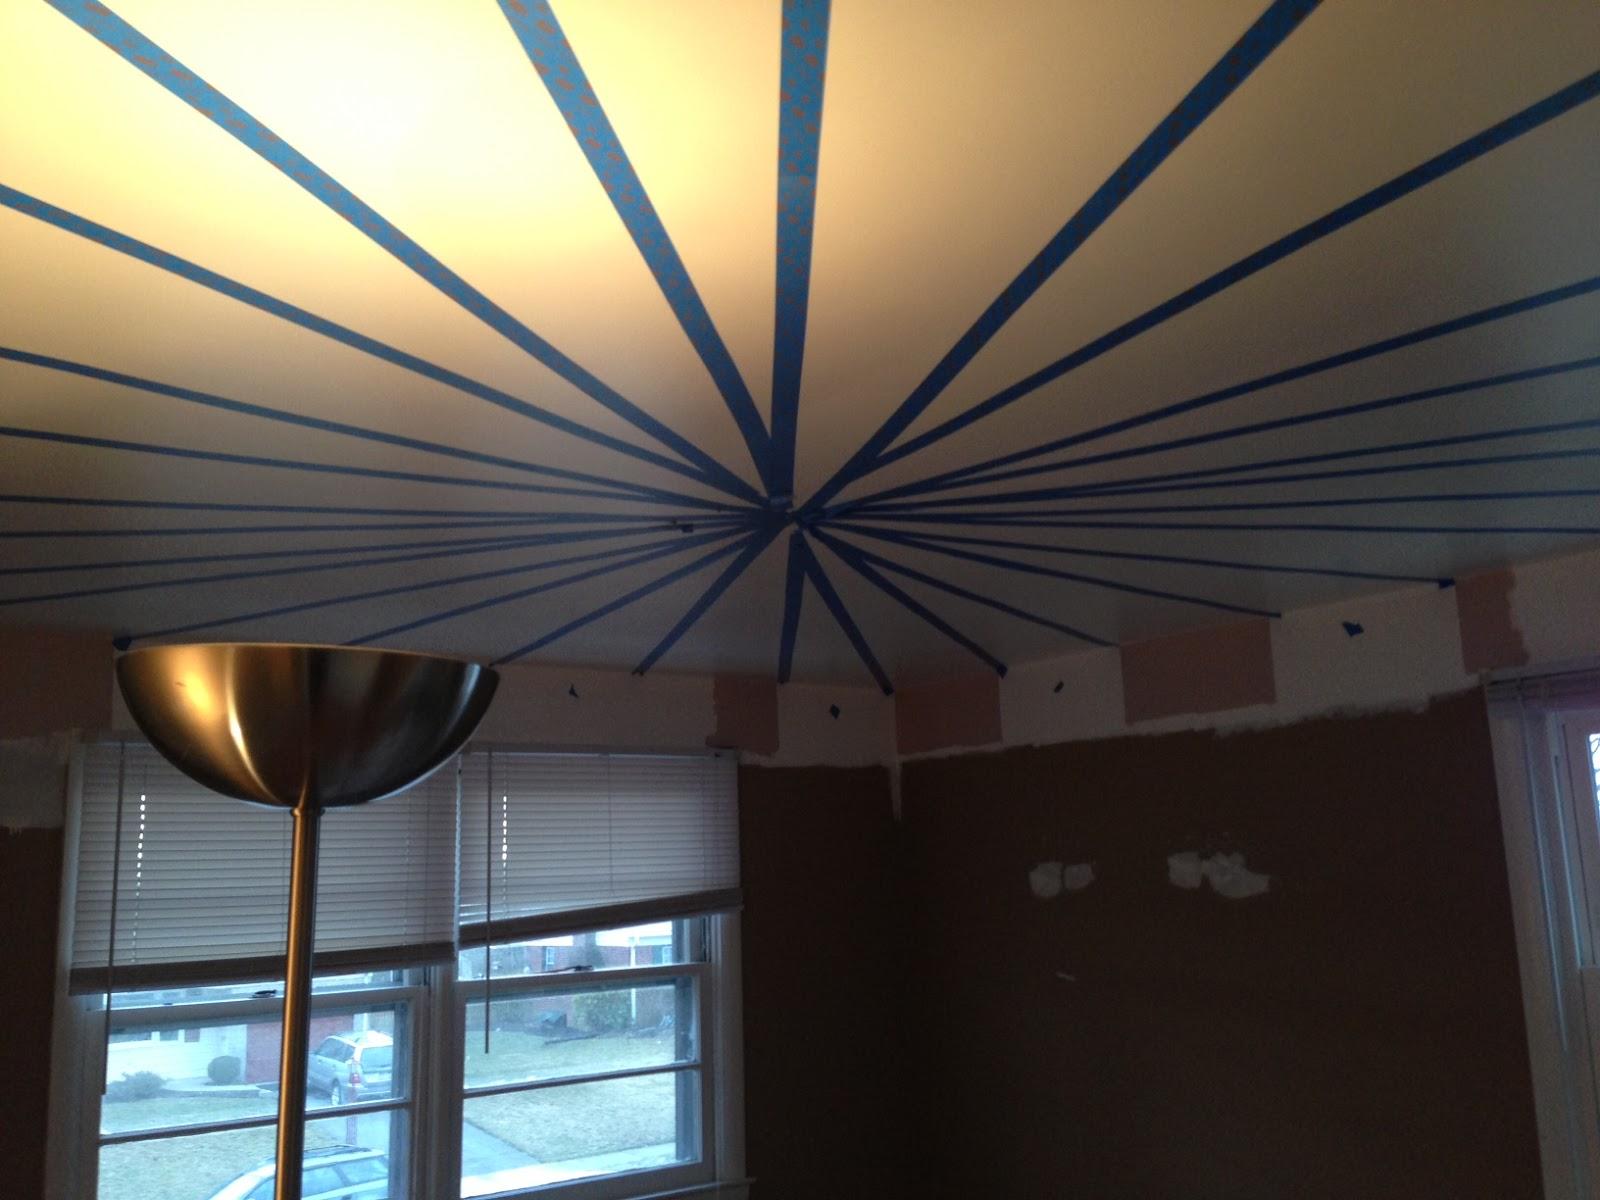 My Mamalicious Journey: DIY Circus Tent Ceiling Tutorial